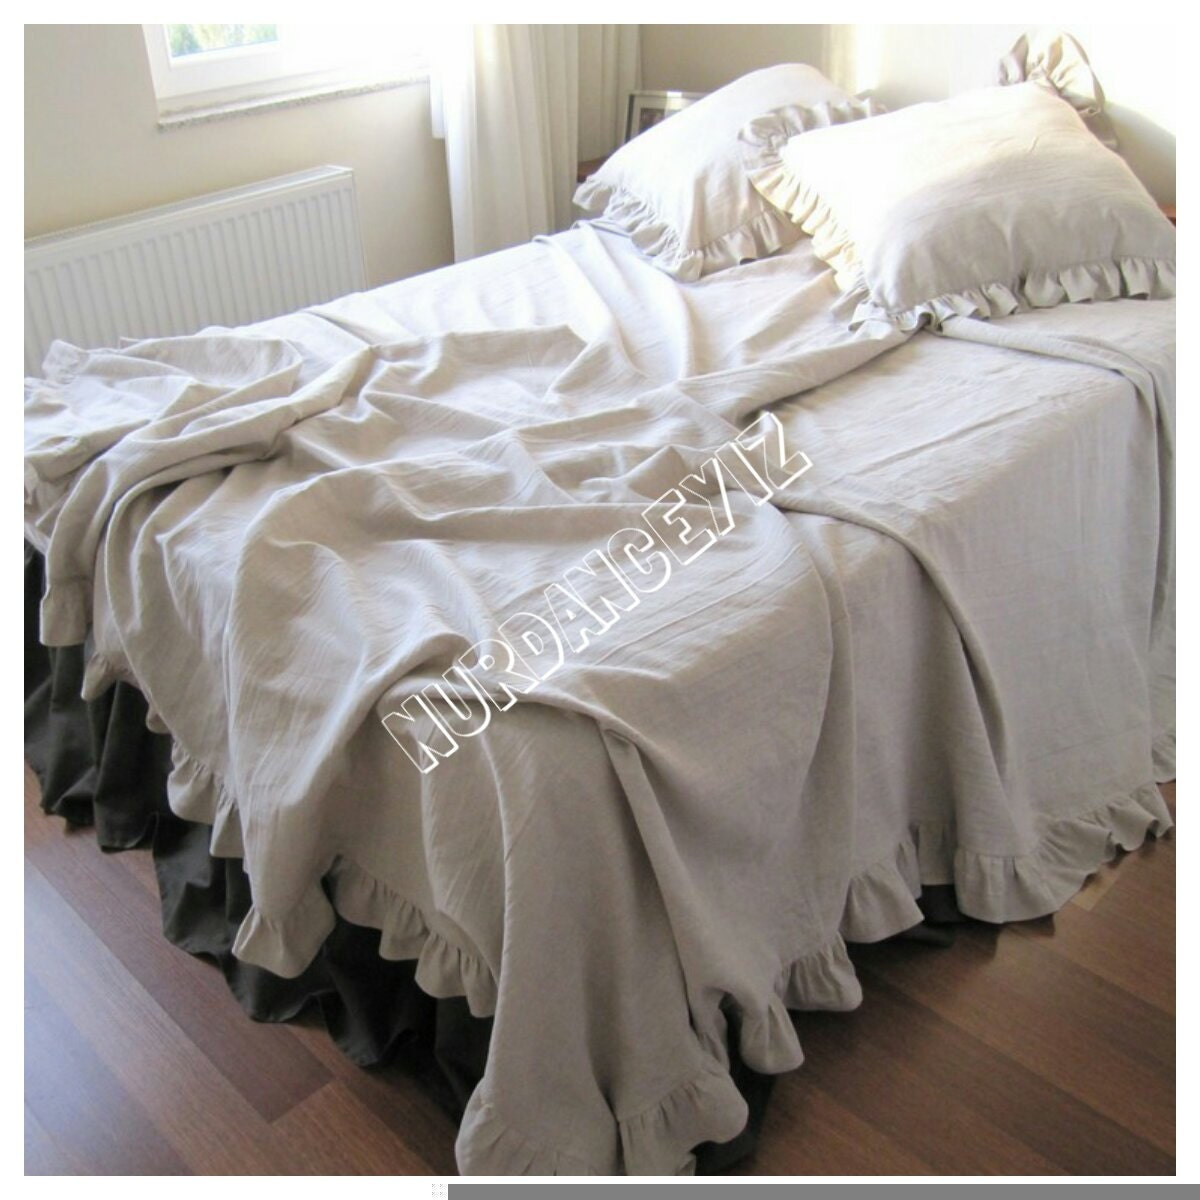 Bedspread King 120x120 queen Bed spread Ruffled Ruffled Bedspreads